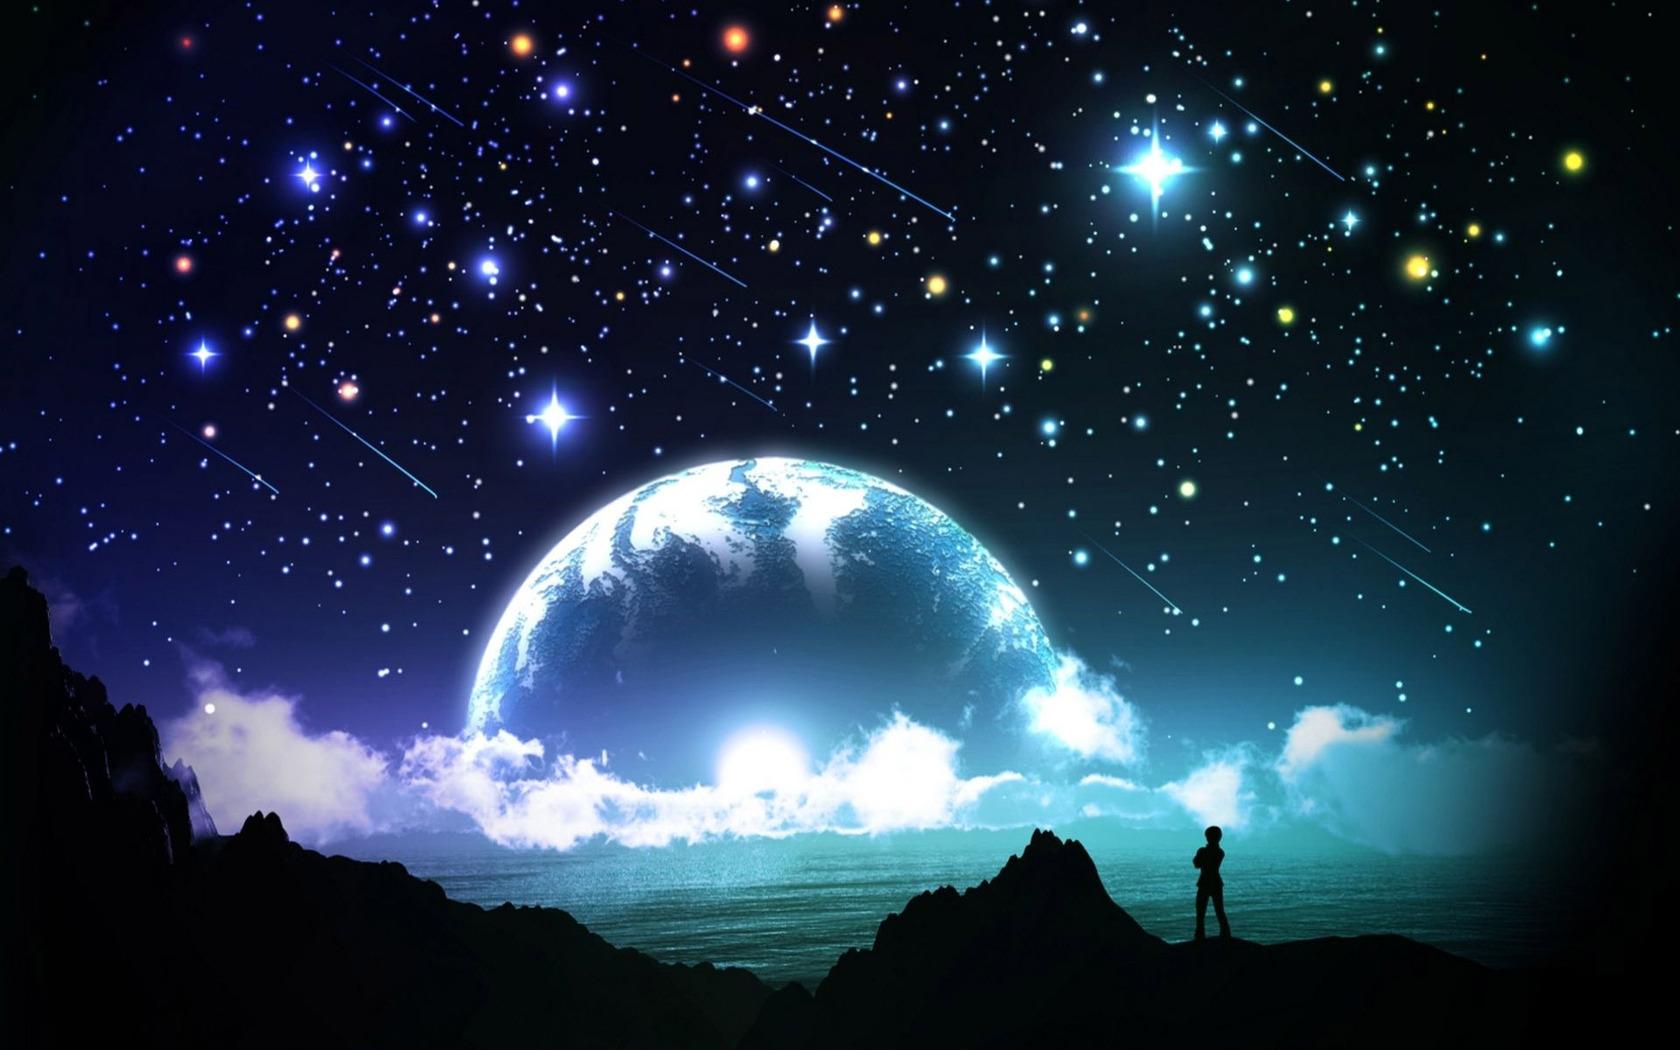 Bright night sky wallpaper 19601 1680x1050